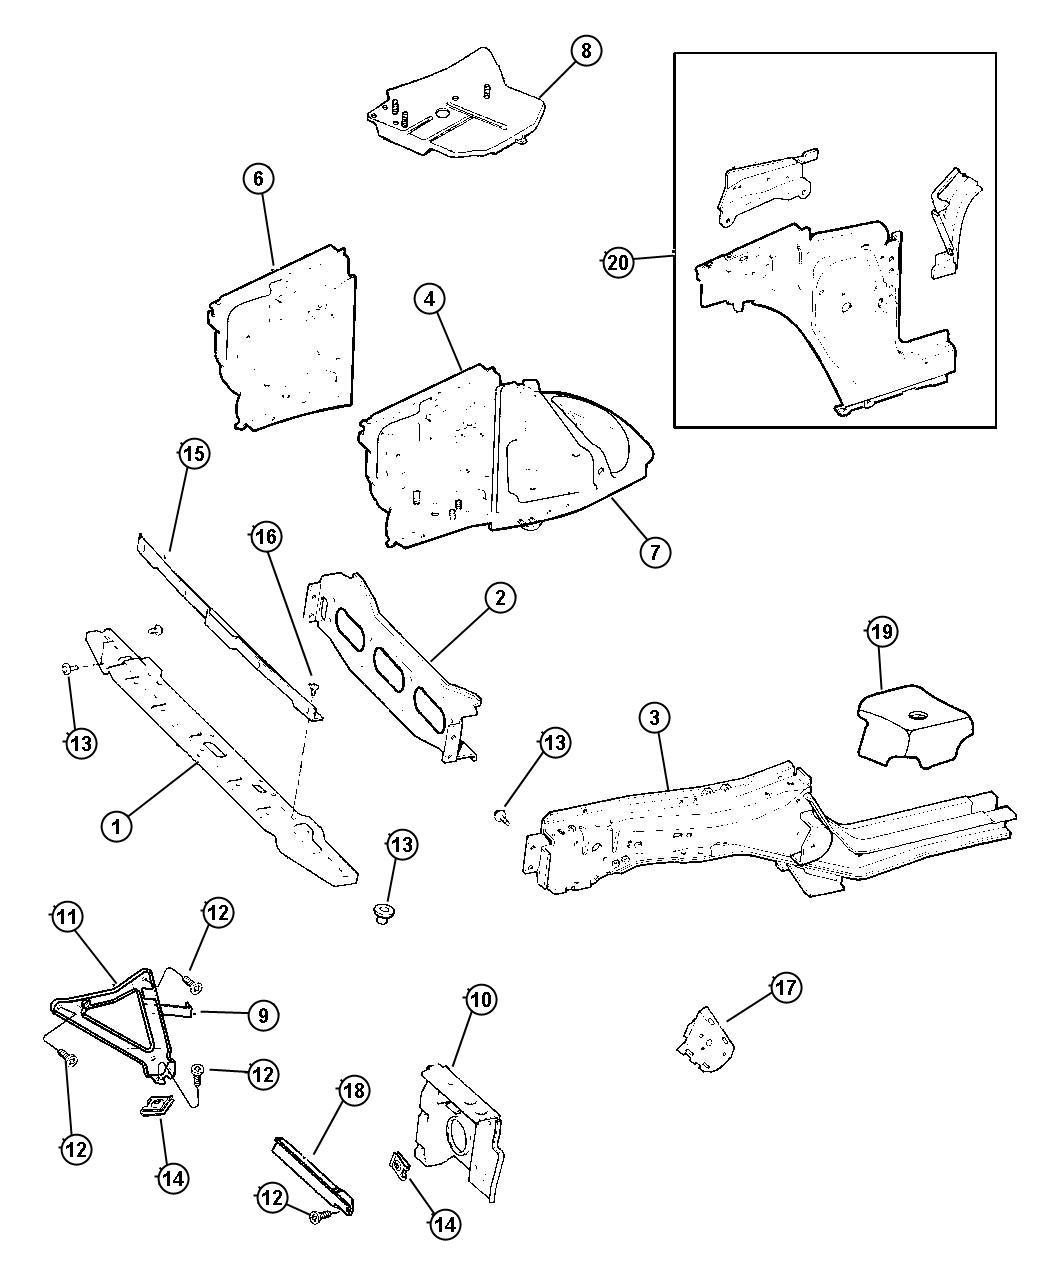 tags: #gmc sonoma body parts#gmc sonoma replacement parts#2001 gmc sonoma  parts#1995 gmc sonoma parts#1998 gmc sonoma parts#2003 gmc sonoma  parts#2000 gmc